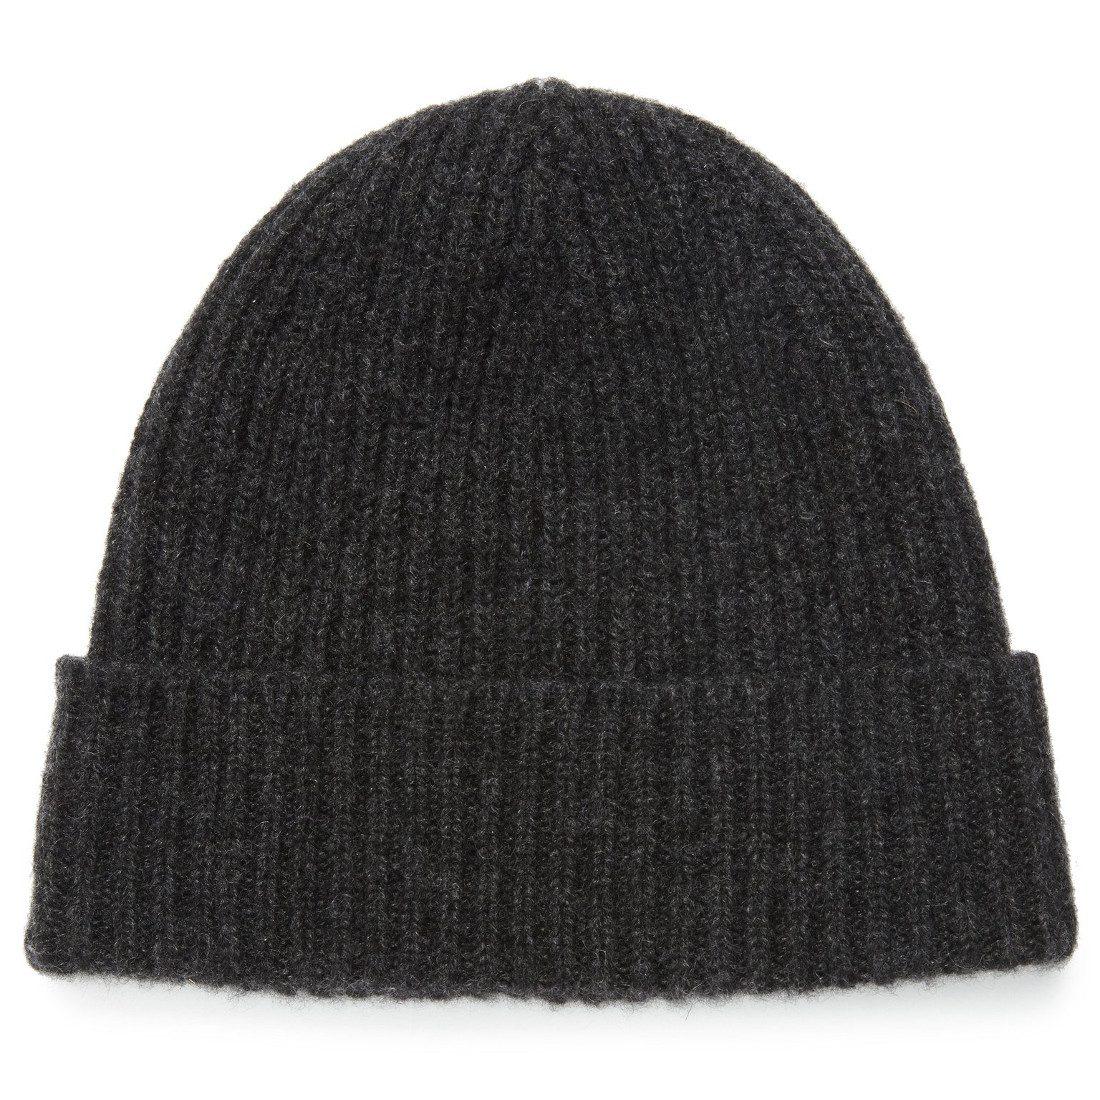 grey-mens-beanie-hat-still-103_1